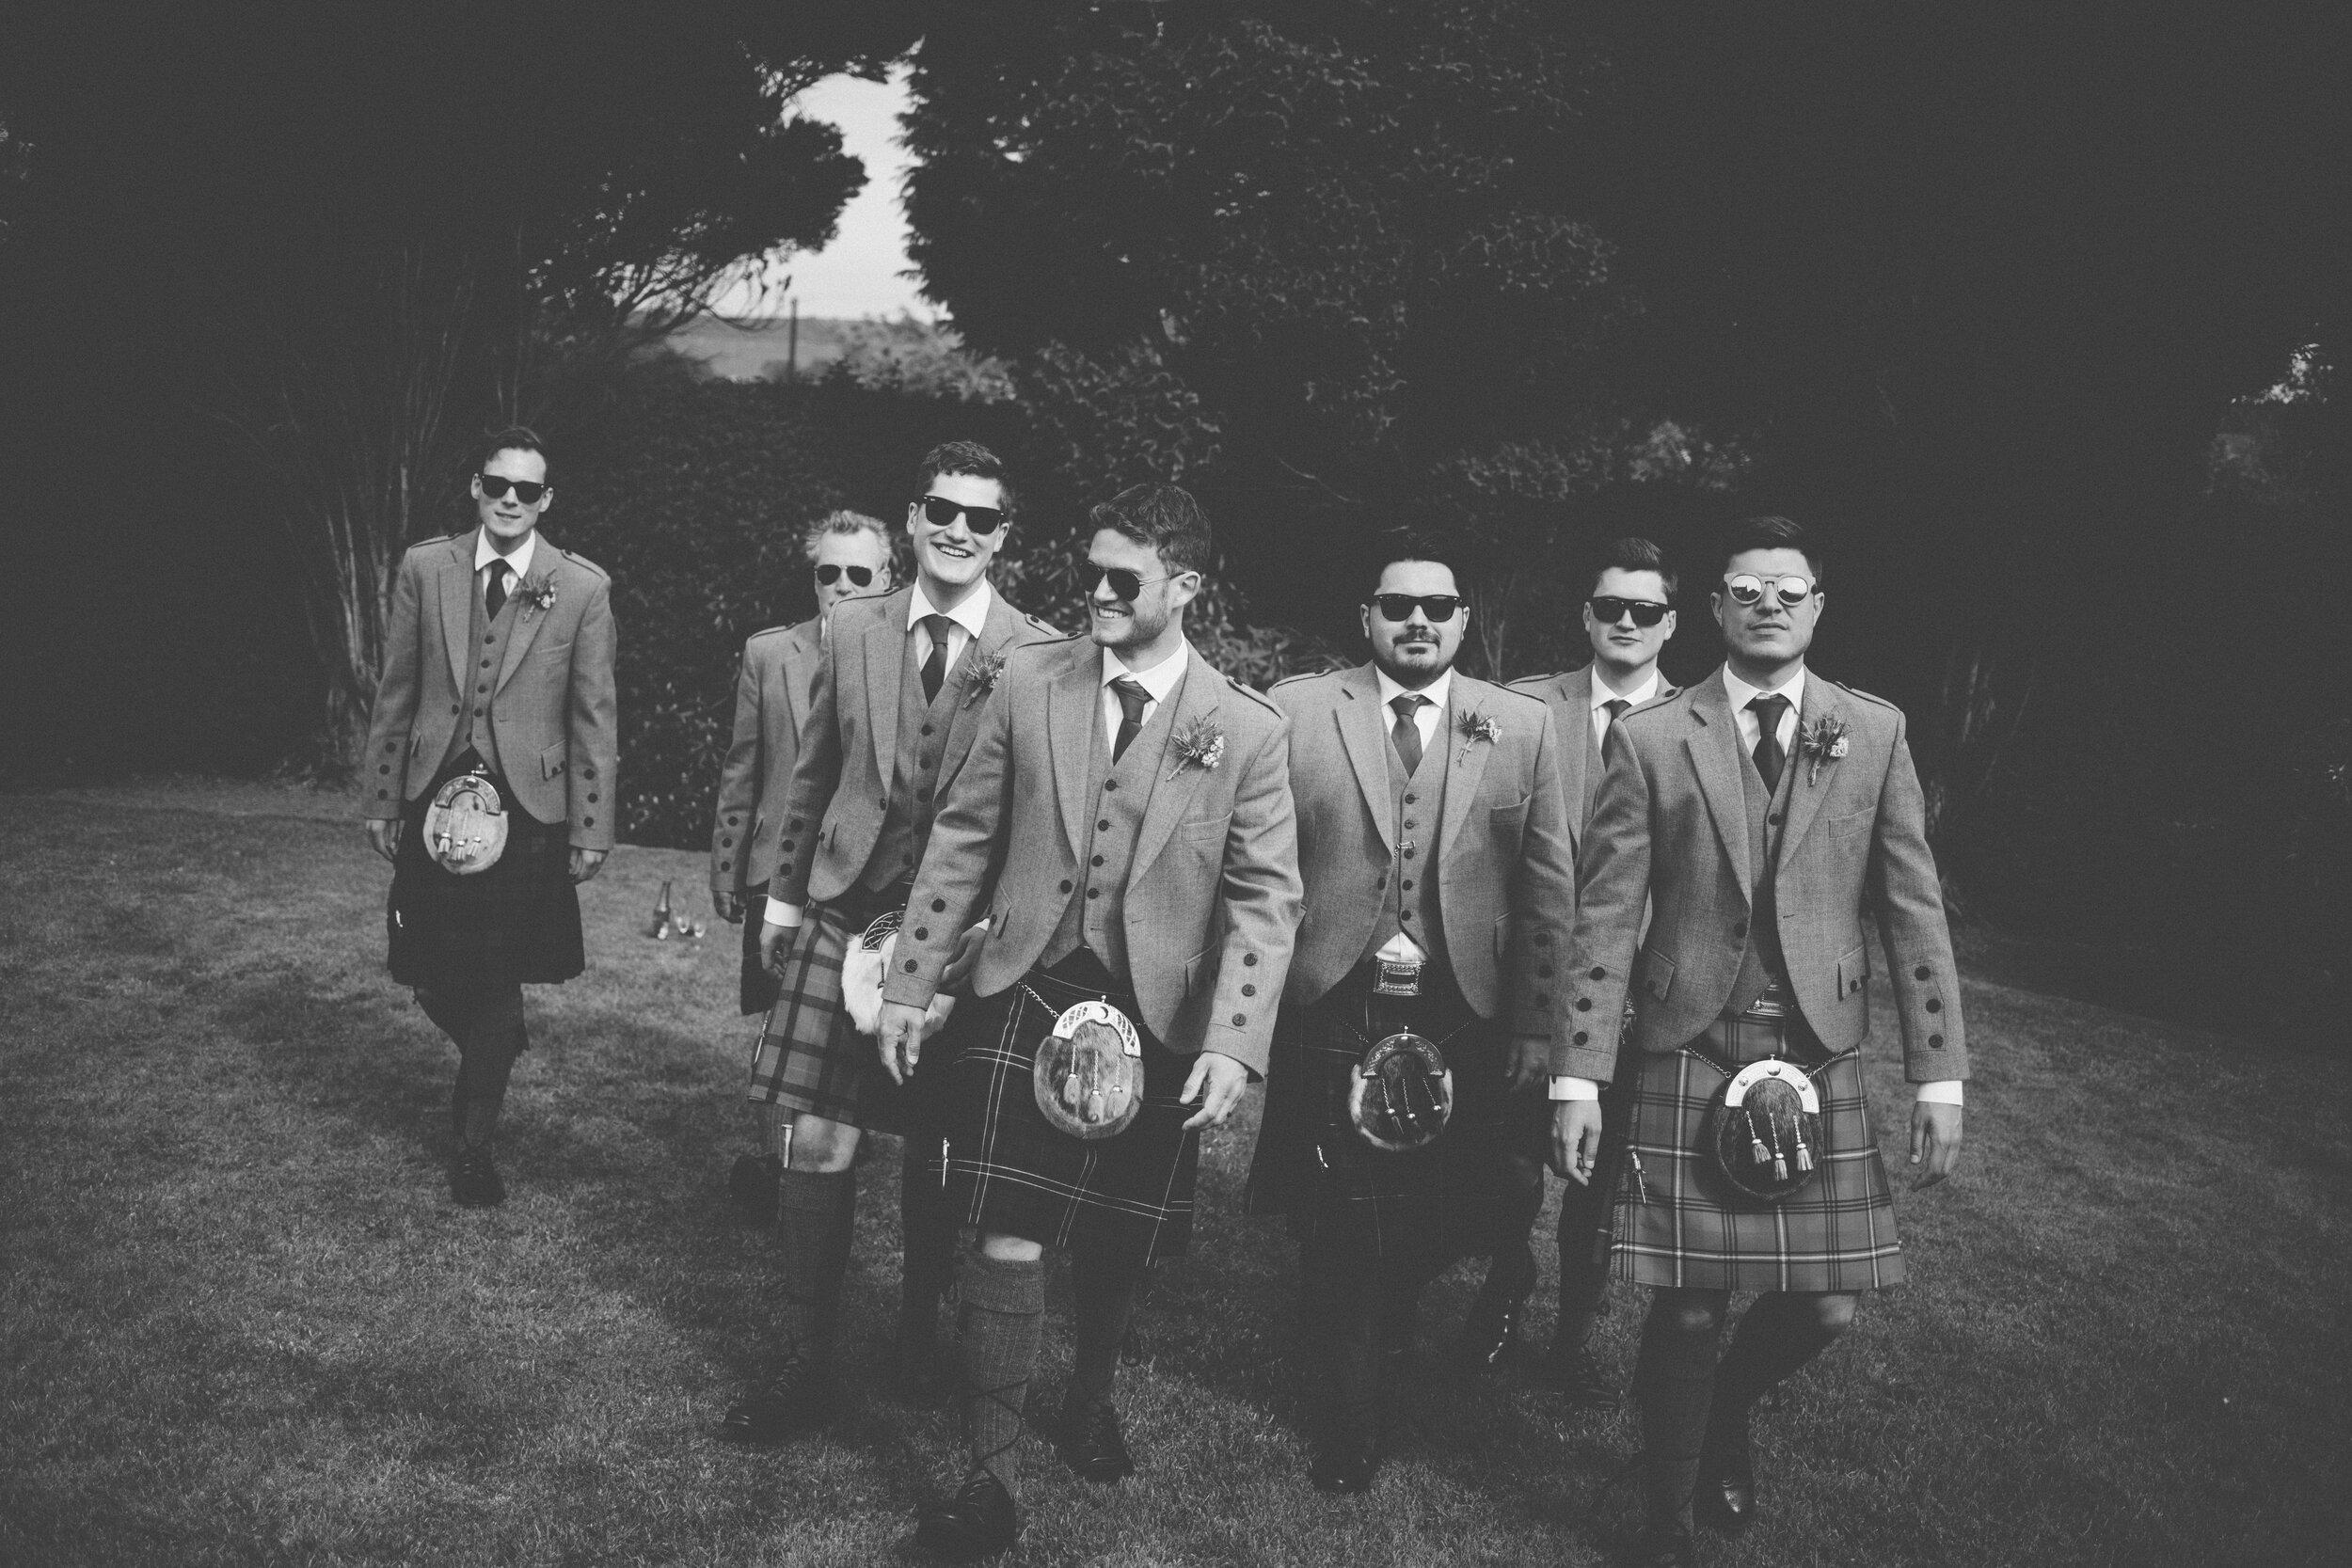 Dalduff Farm Ayrshire Wedding Photography - Claire Basiuk Photographer - 15.jpg